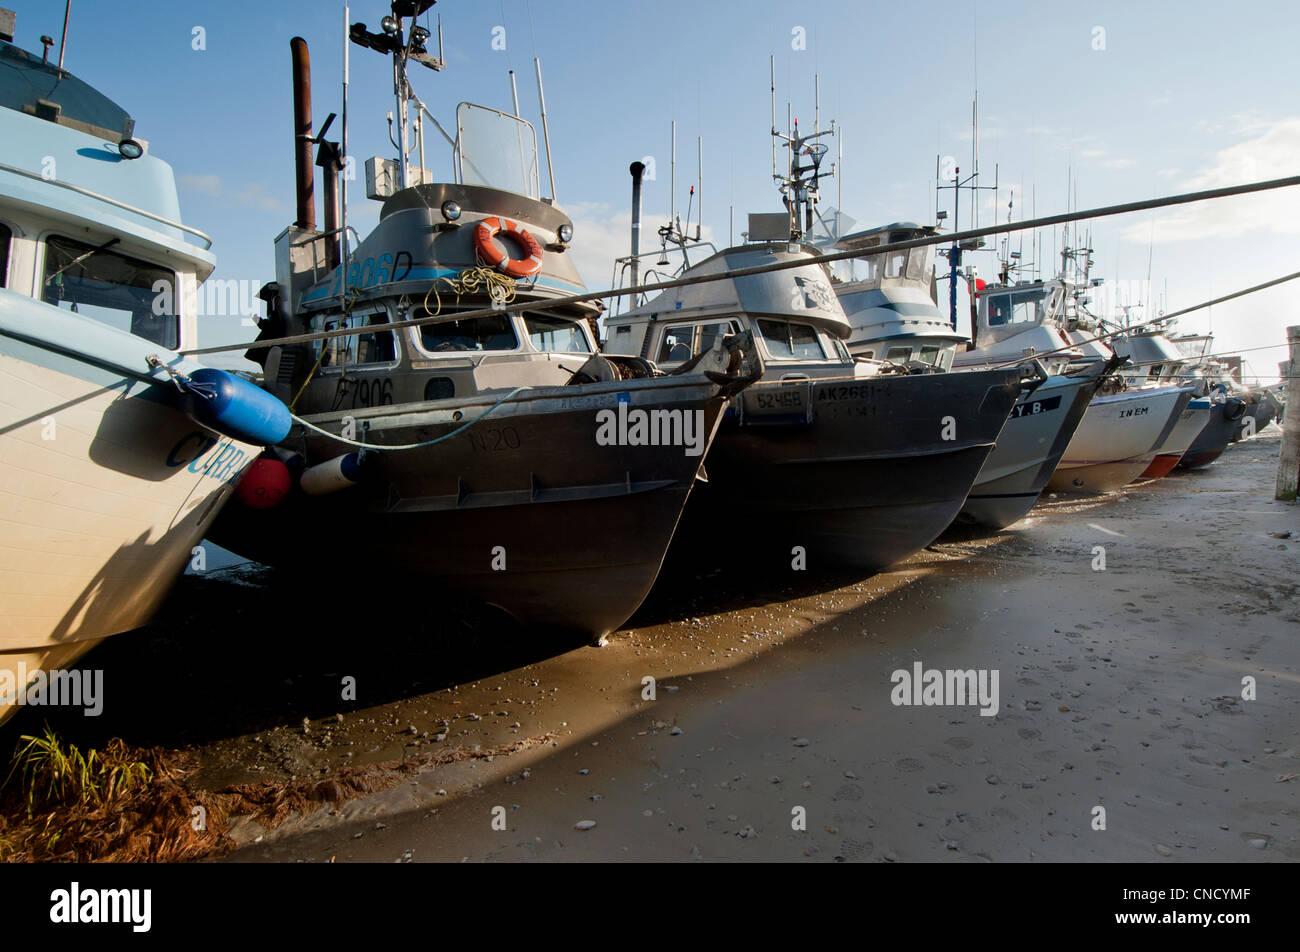 A row of drift net boats moored on the mud flats near Leader Creek in Naknek, Bristol Bay, Alaska - Stock Image